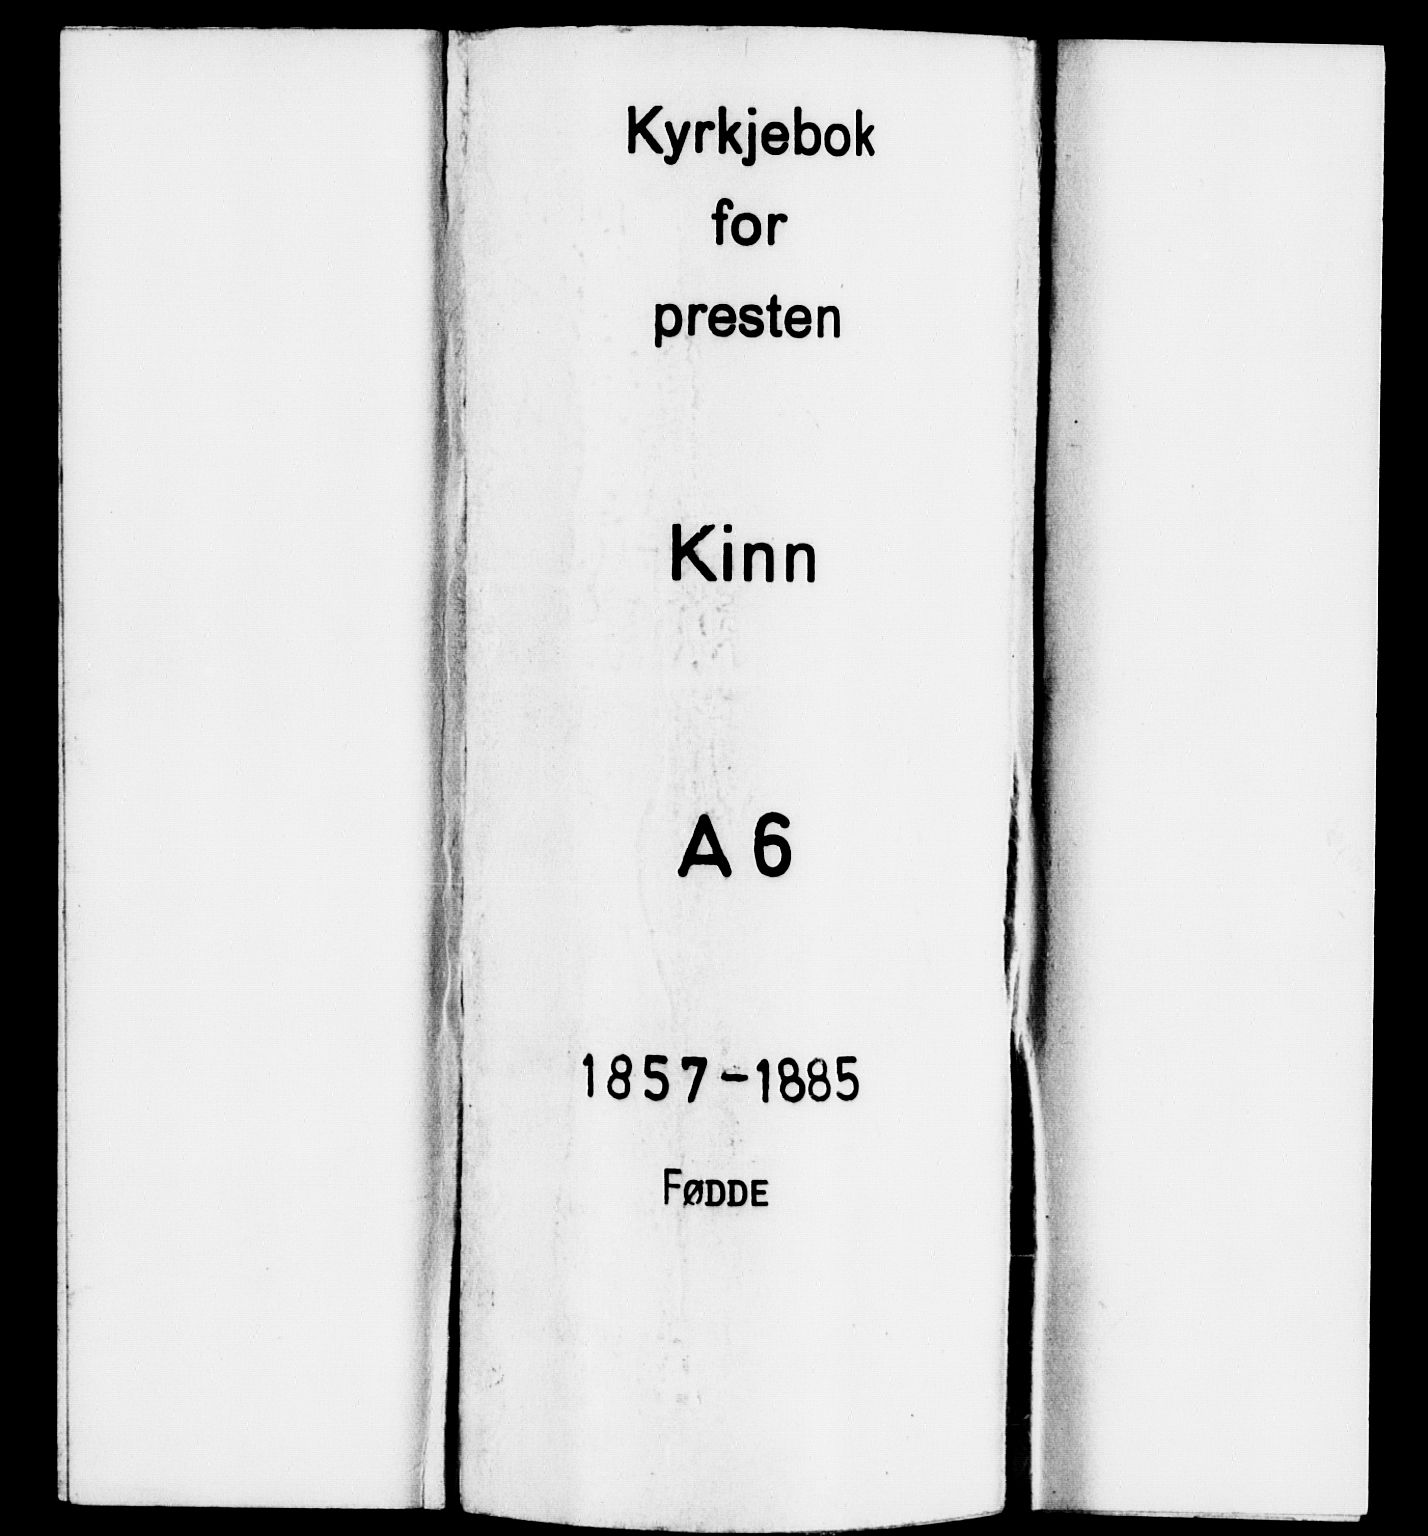 SAB, Kinn sokneprestembete, H/Haa/Haaa/L0006: Ministerialbok nr. A 6, 1857-1885